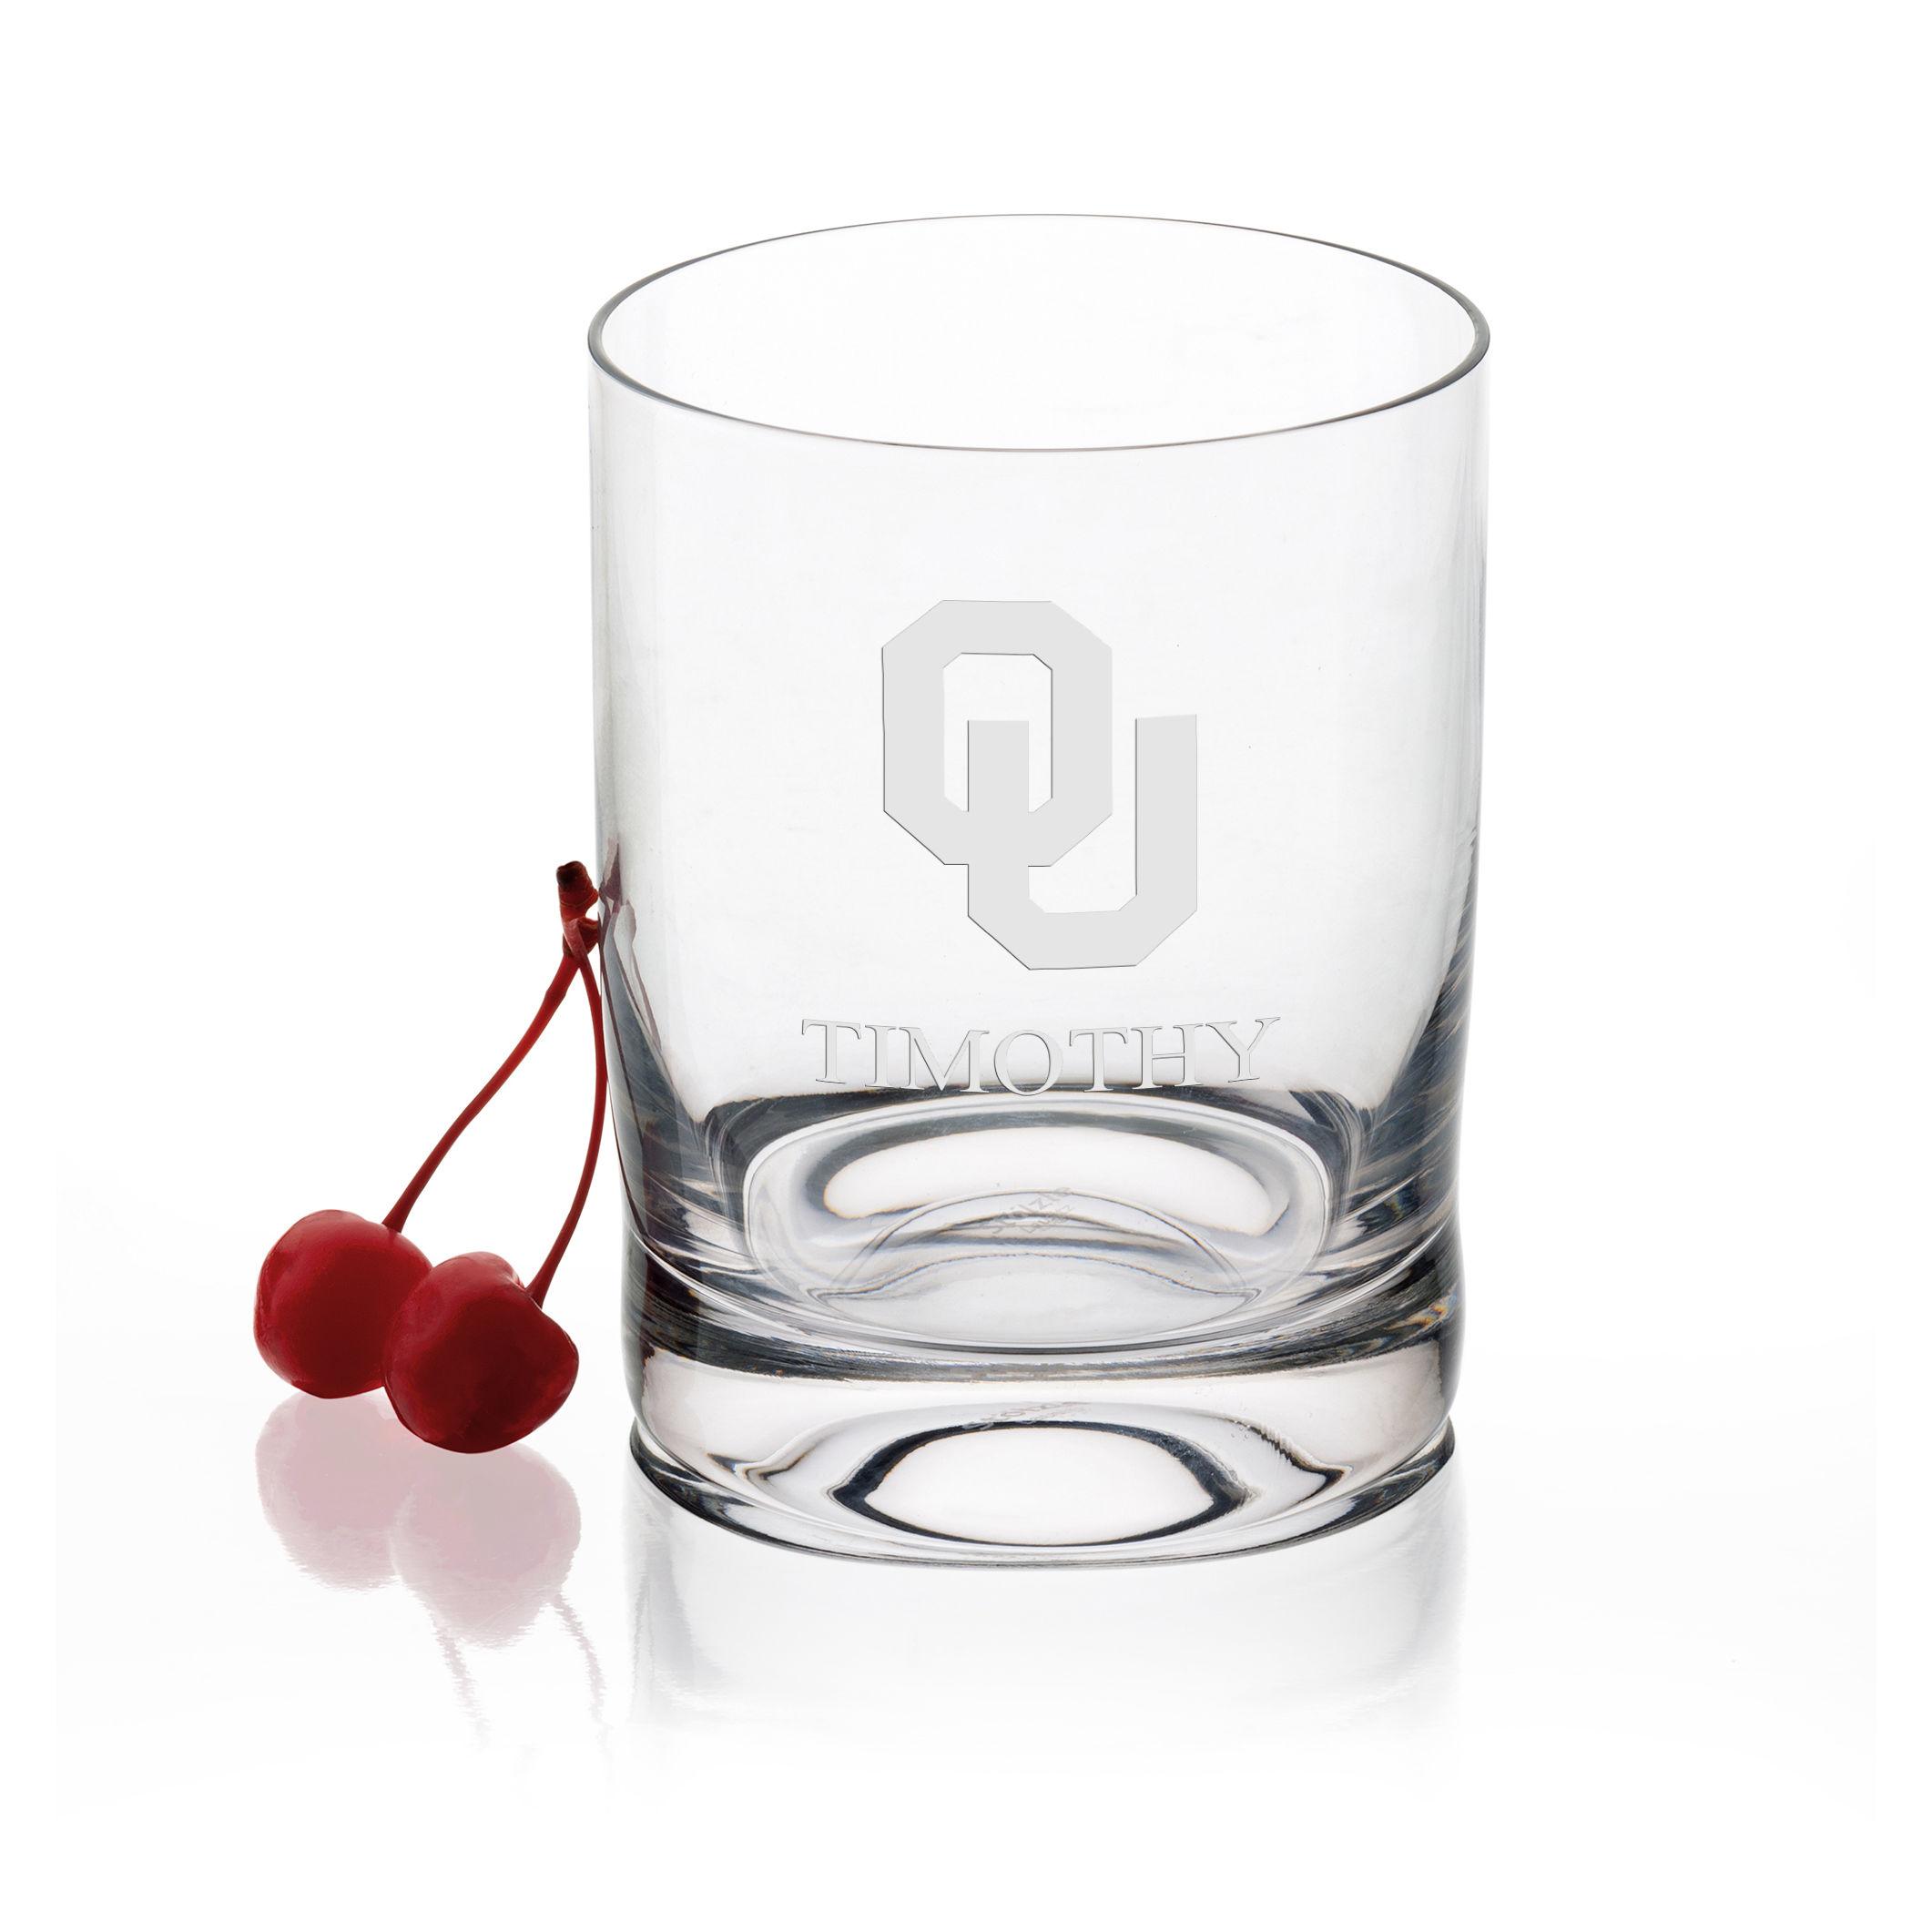 Oklahoma Tumbler Glasses - Set of 4